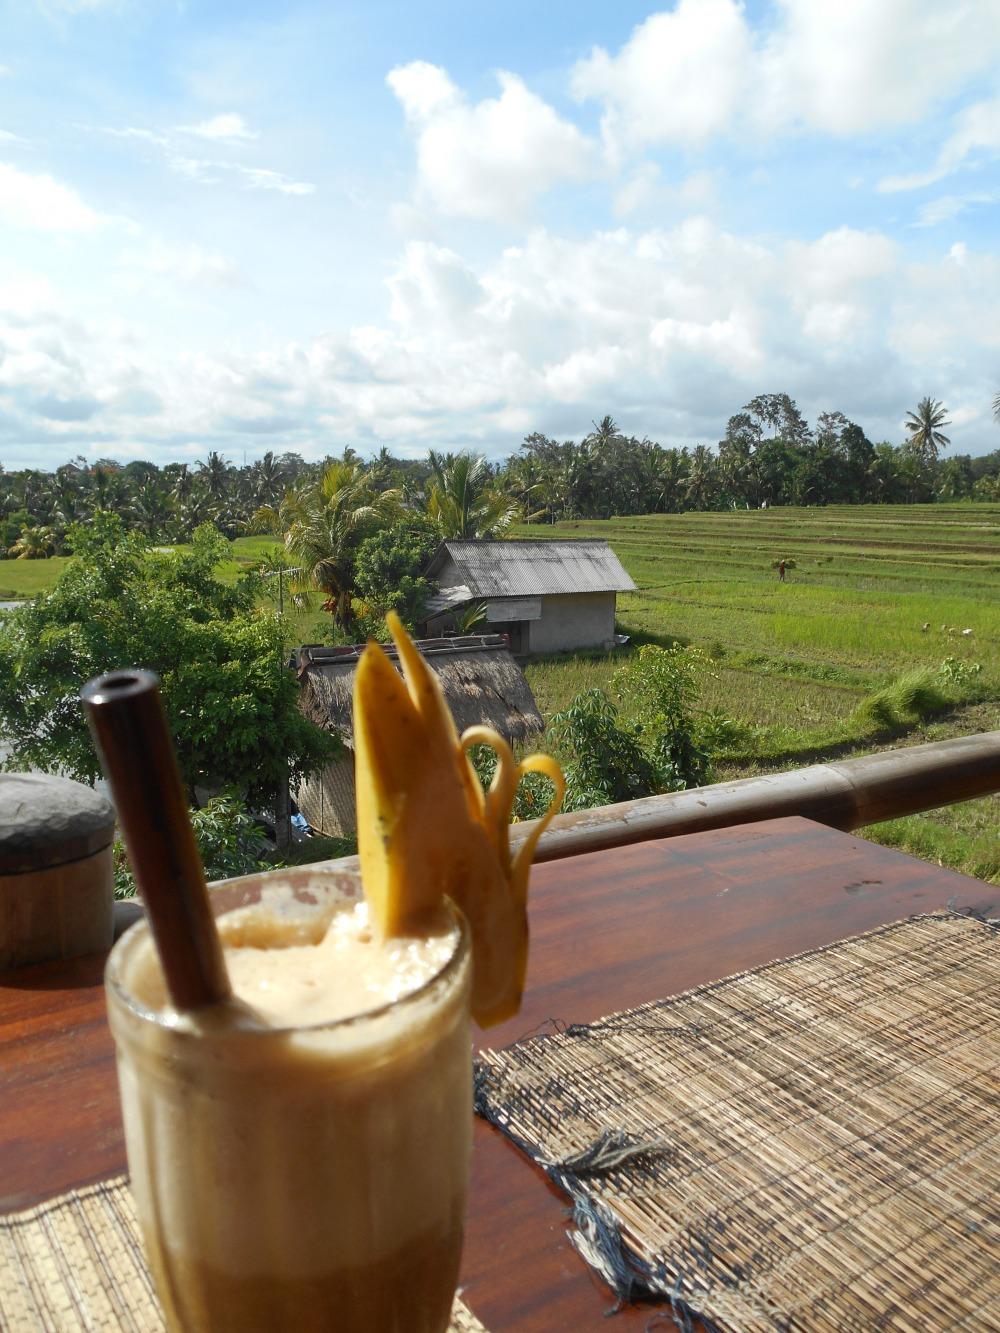 Sari Organik bananenshake Ubud Bali Indonesië, Zuid Oost-Azië